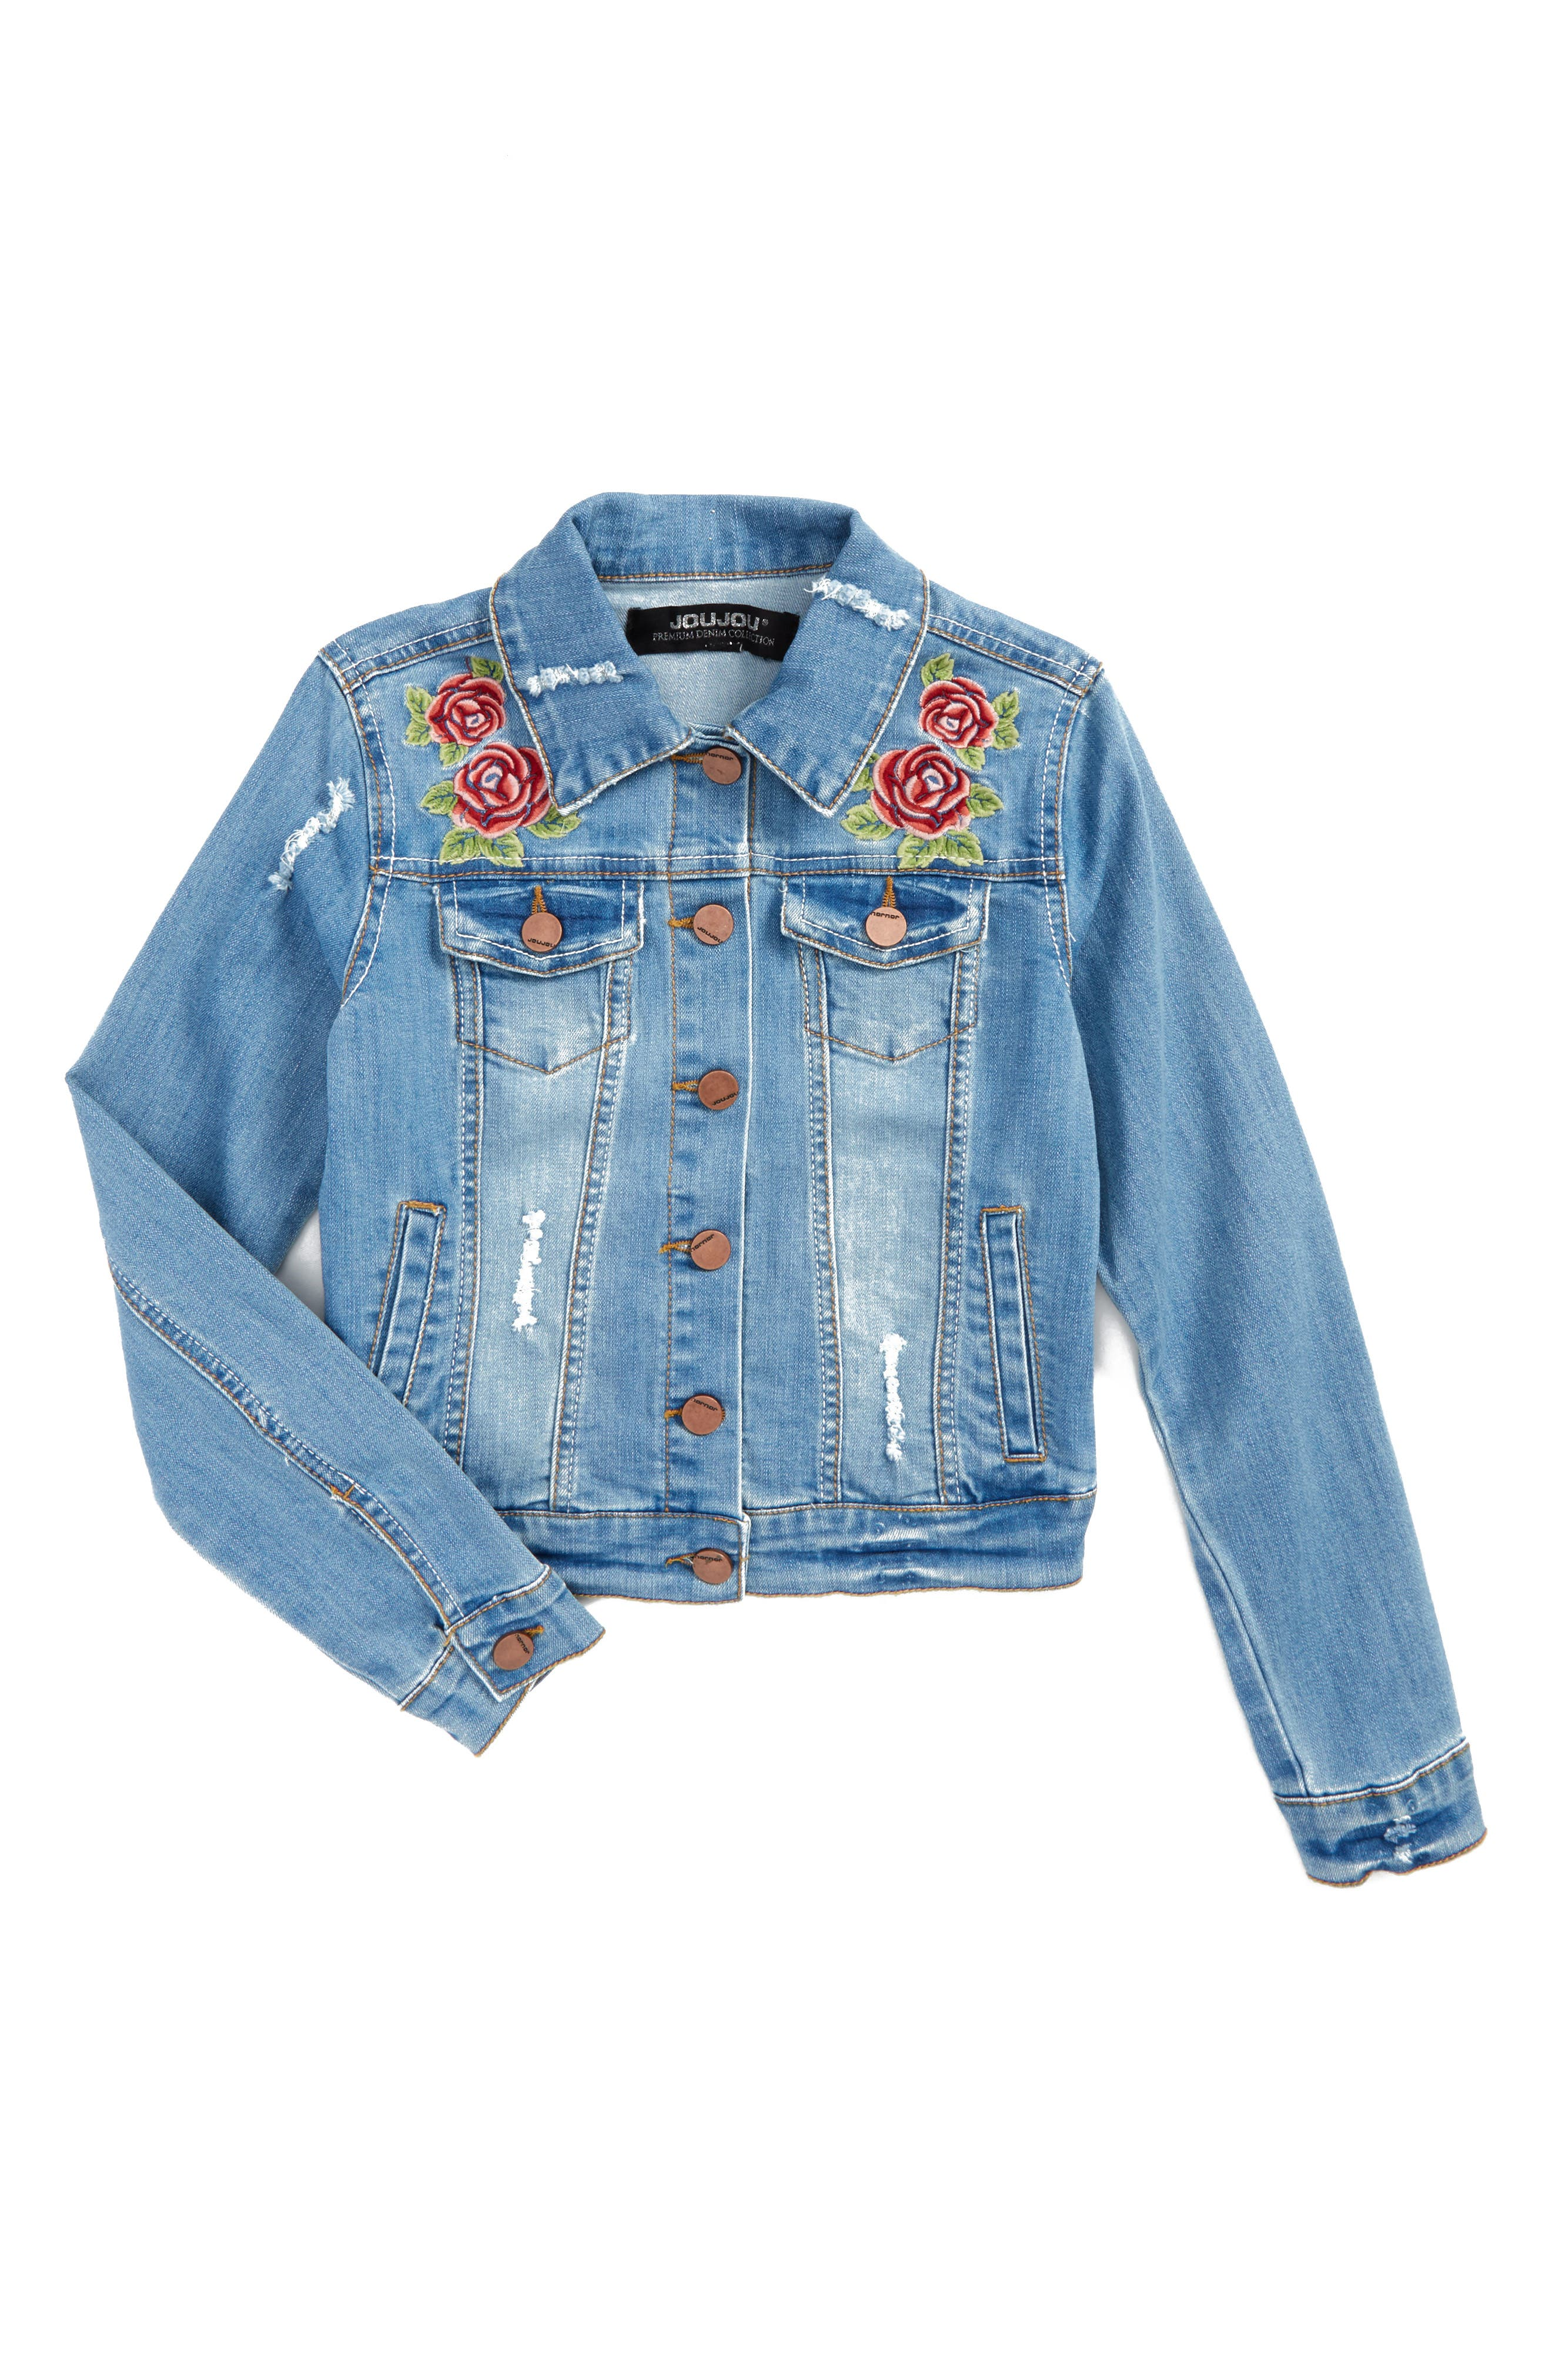 Alternate Image 1 Selected - Jou Jou Embroidered Denim Jacket (Big Girls)